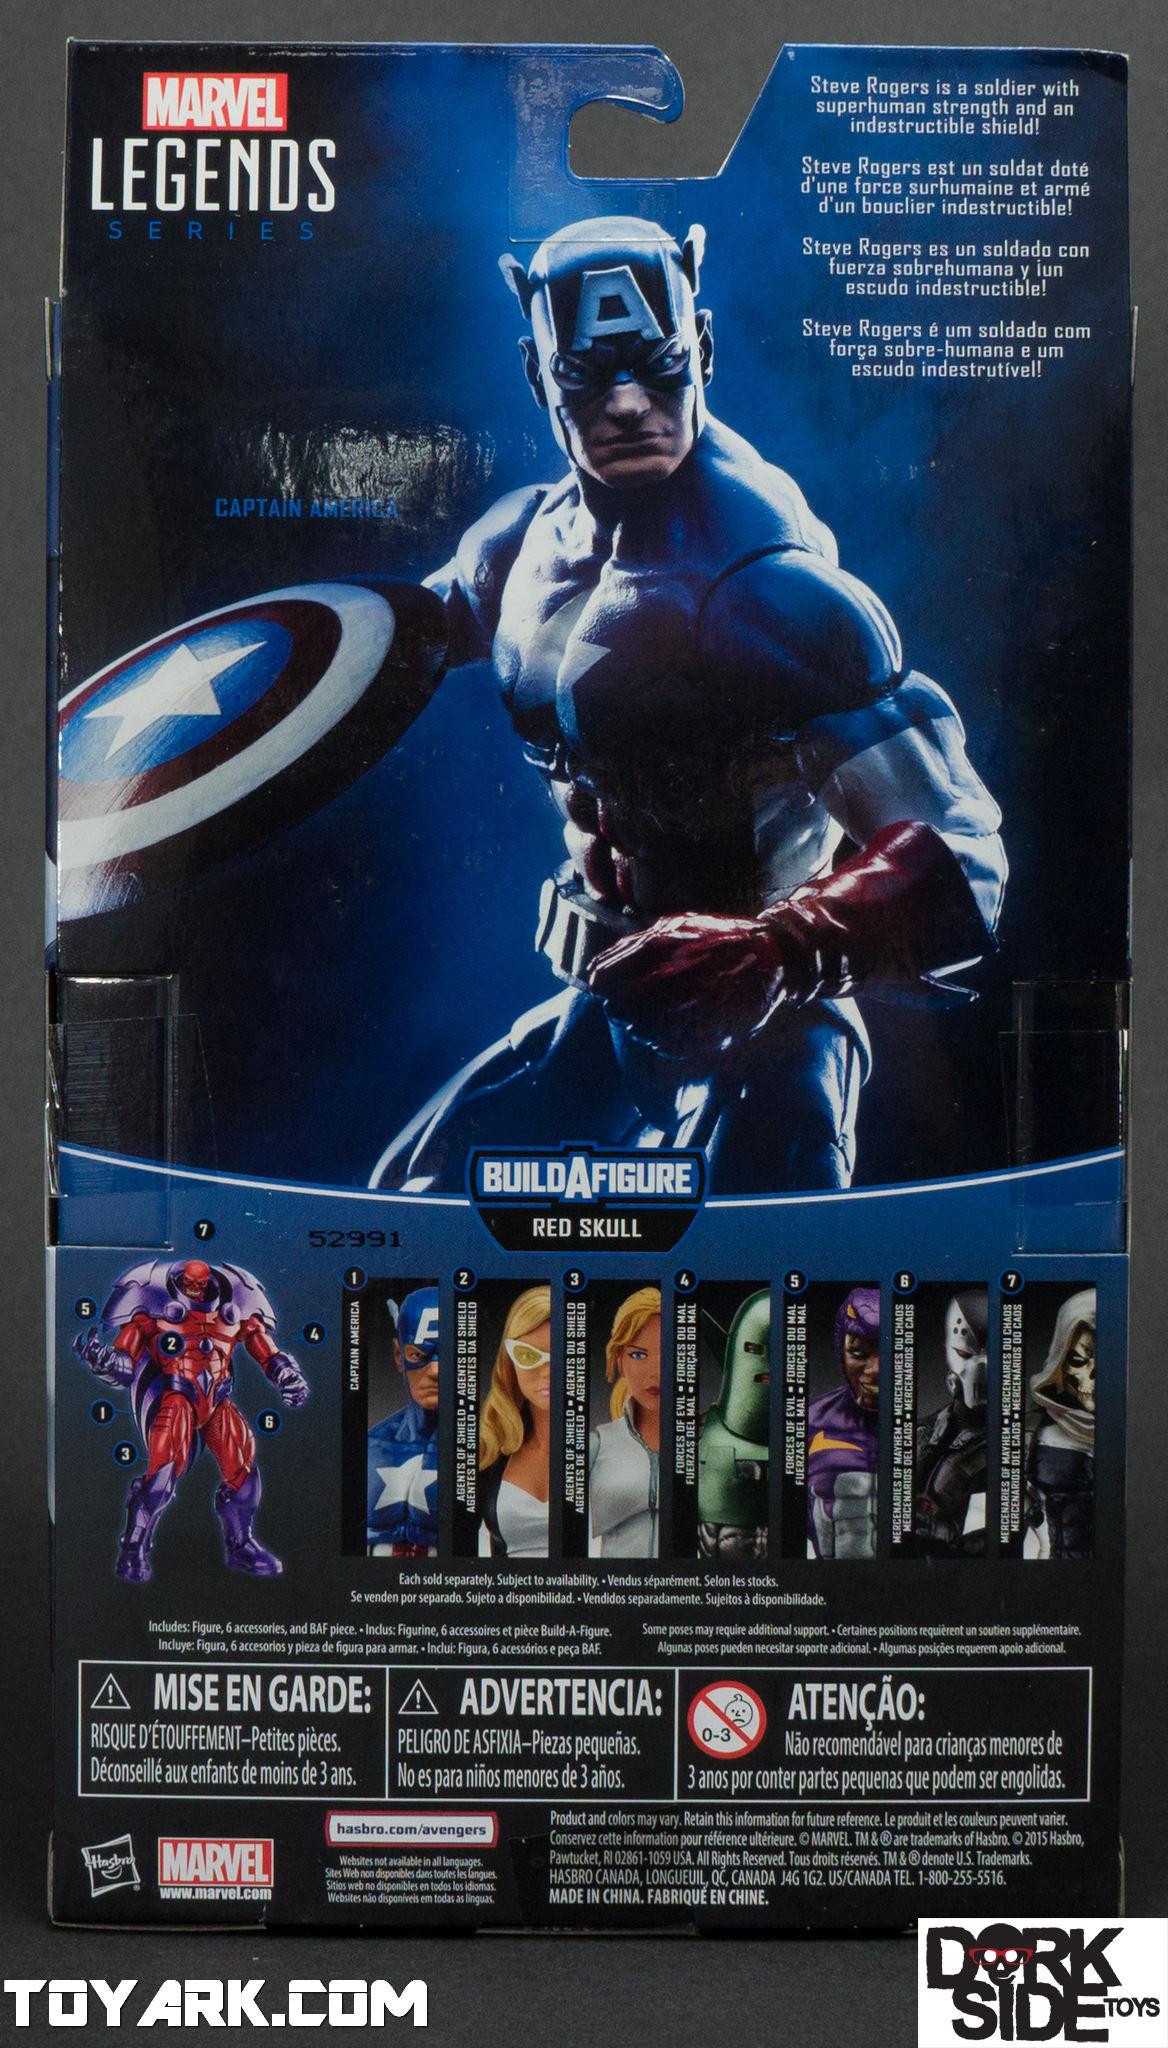 Marvel Legends Civil War Captain America Photo Shoot  The